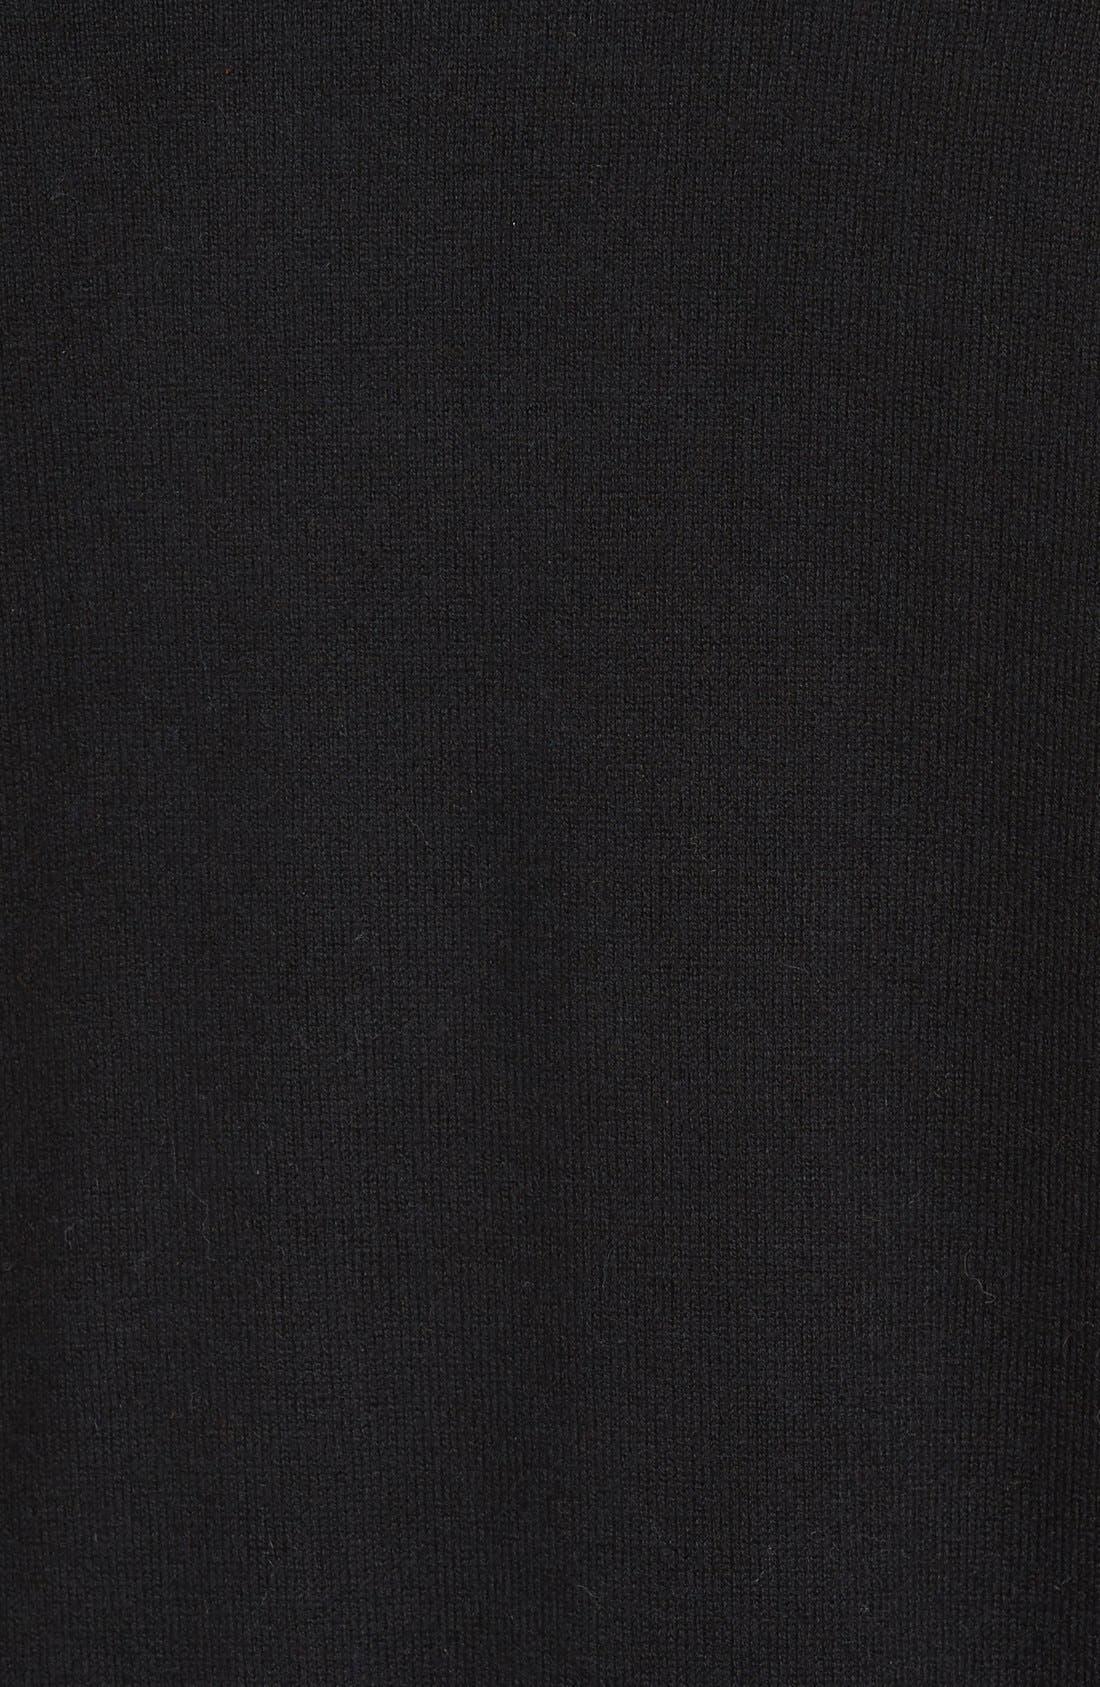 'Jersey Sport' Cotton Blend Crewneck Sweater,                             Alternate thumbnail 5, color,                             001